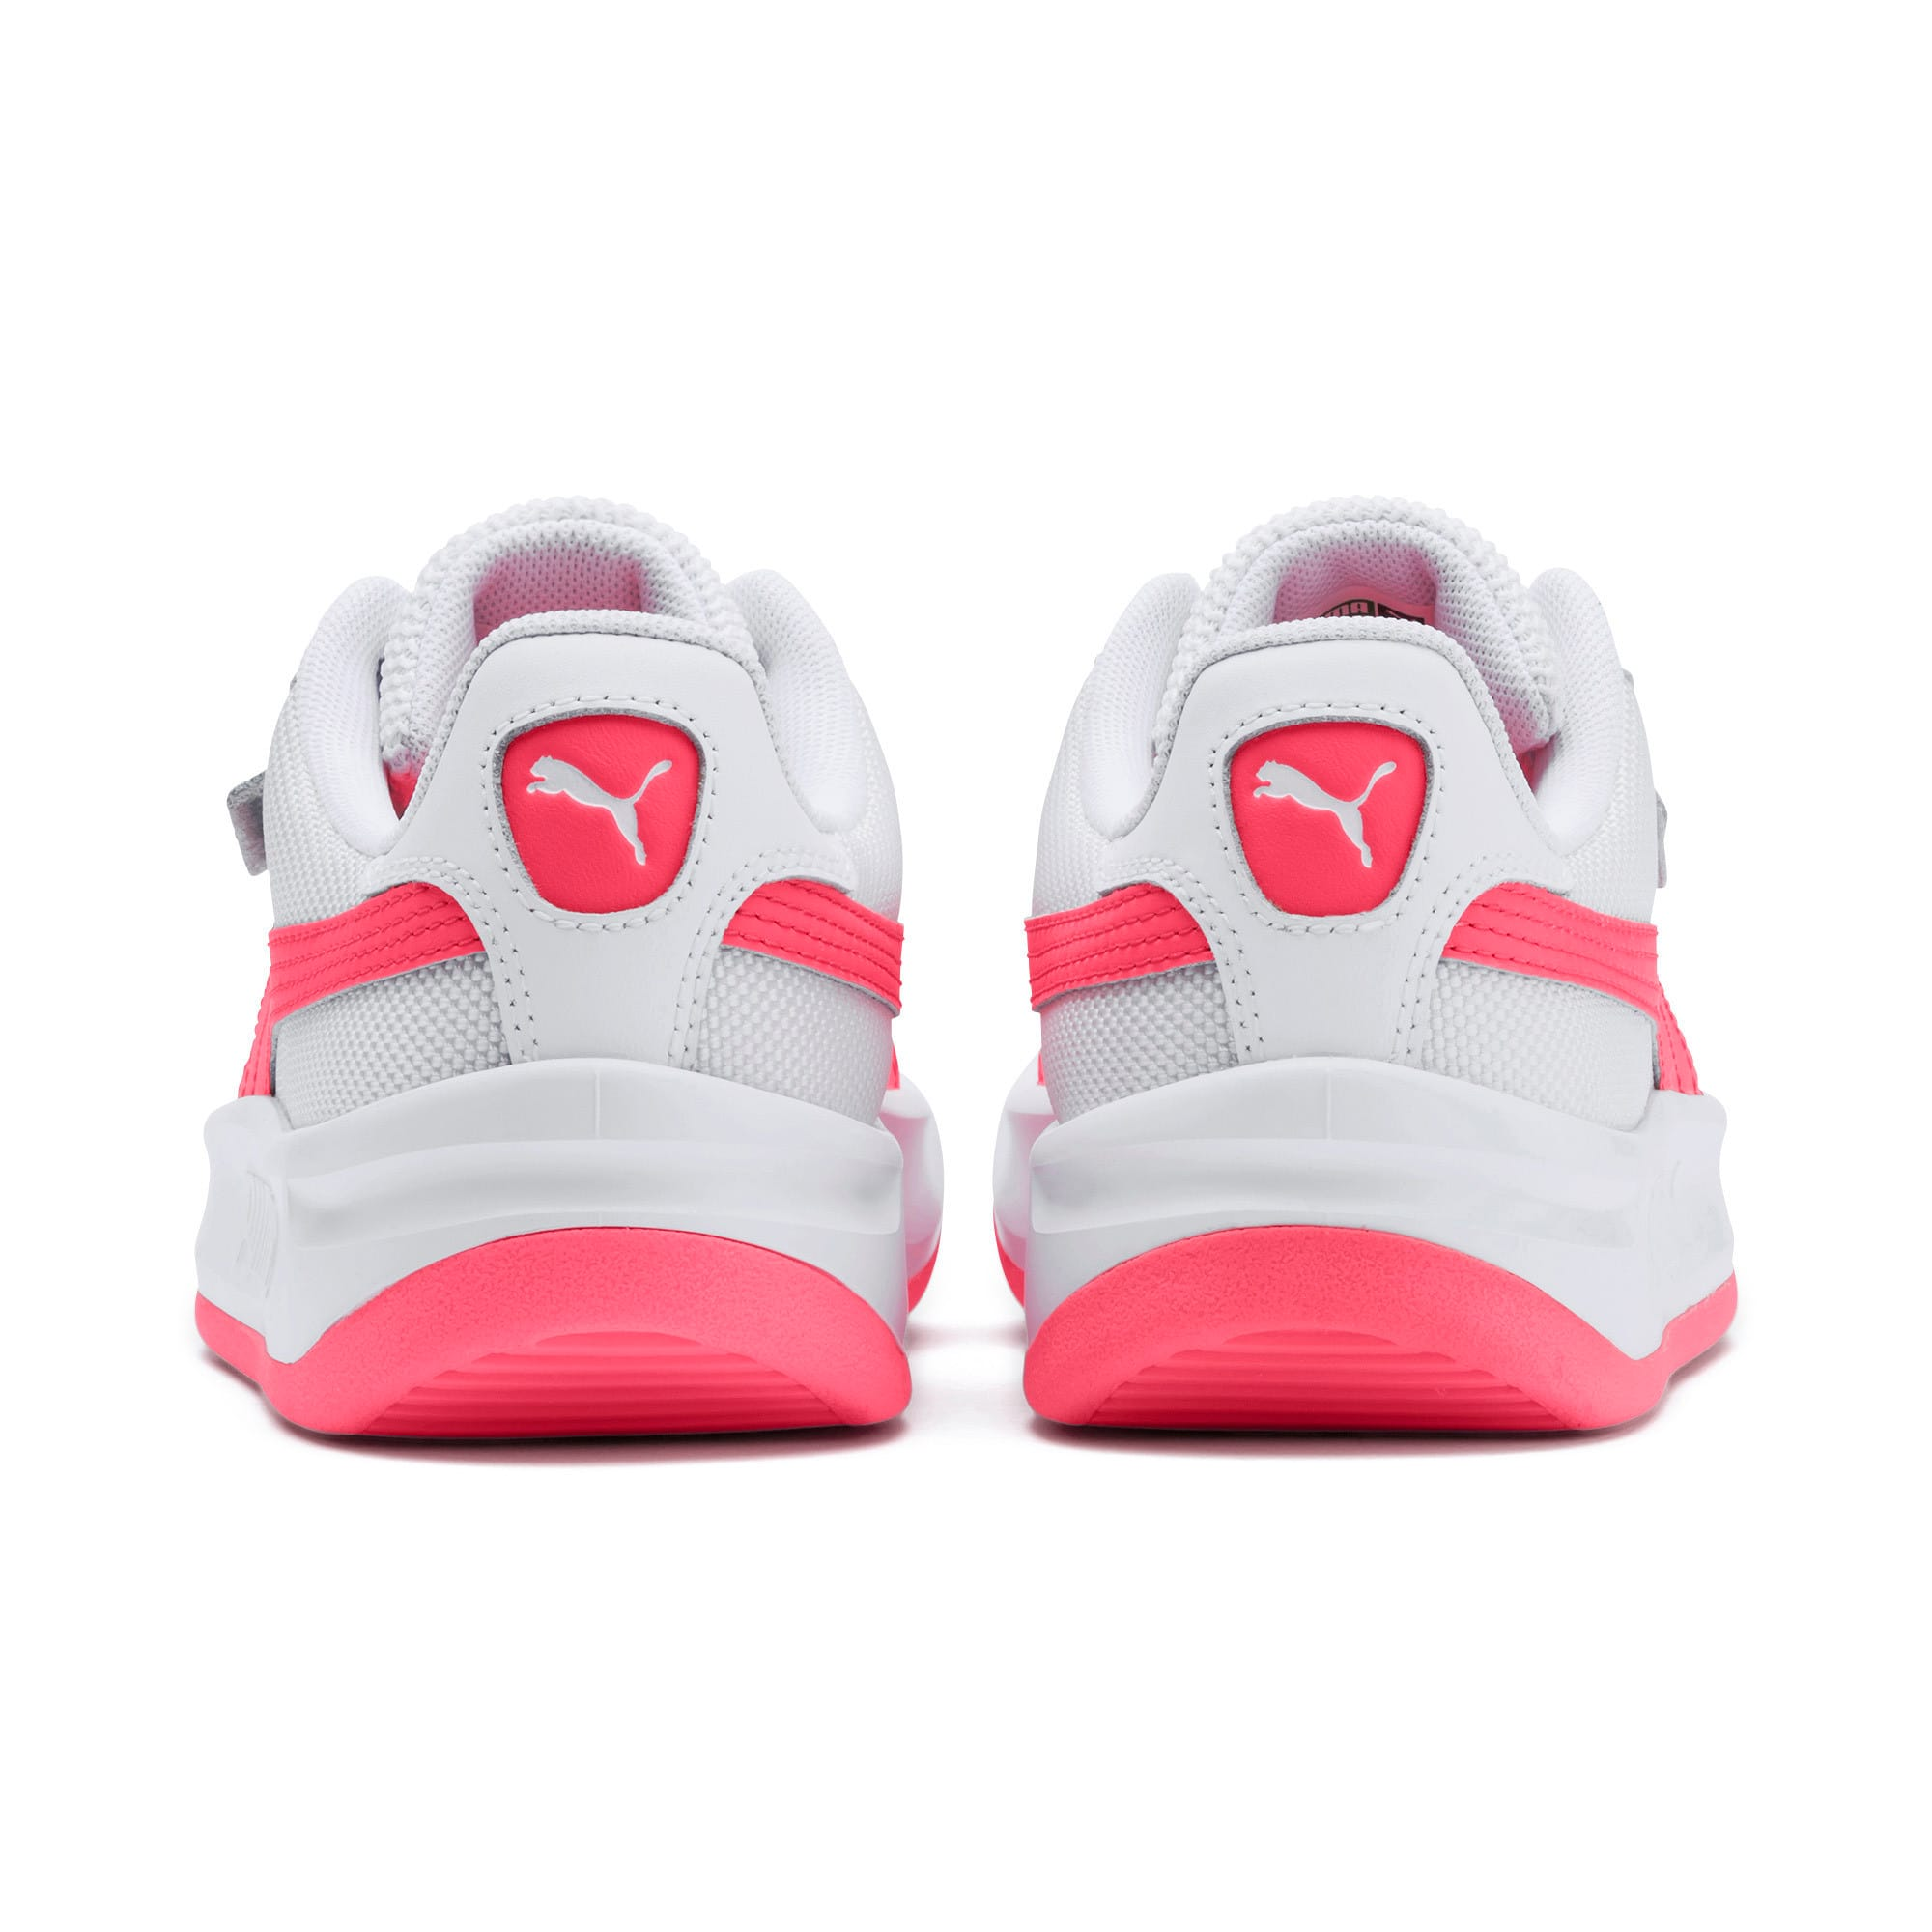 Thumbnail 3 of California Sneakers JR, Puma White-Pink Alert, medium